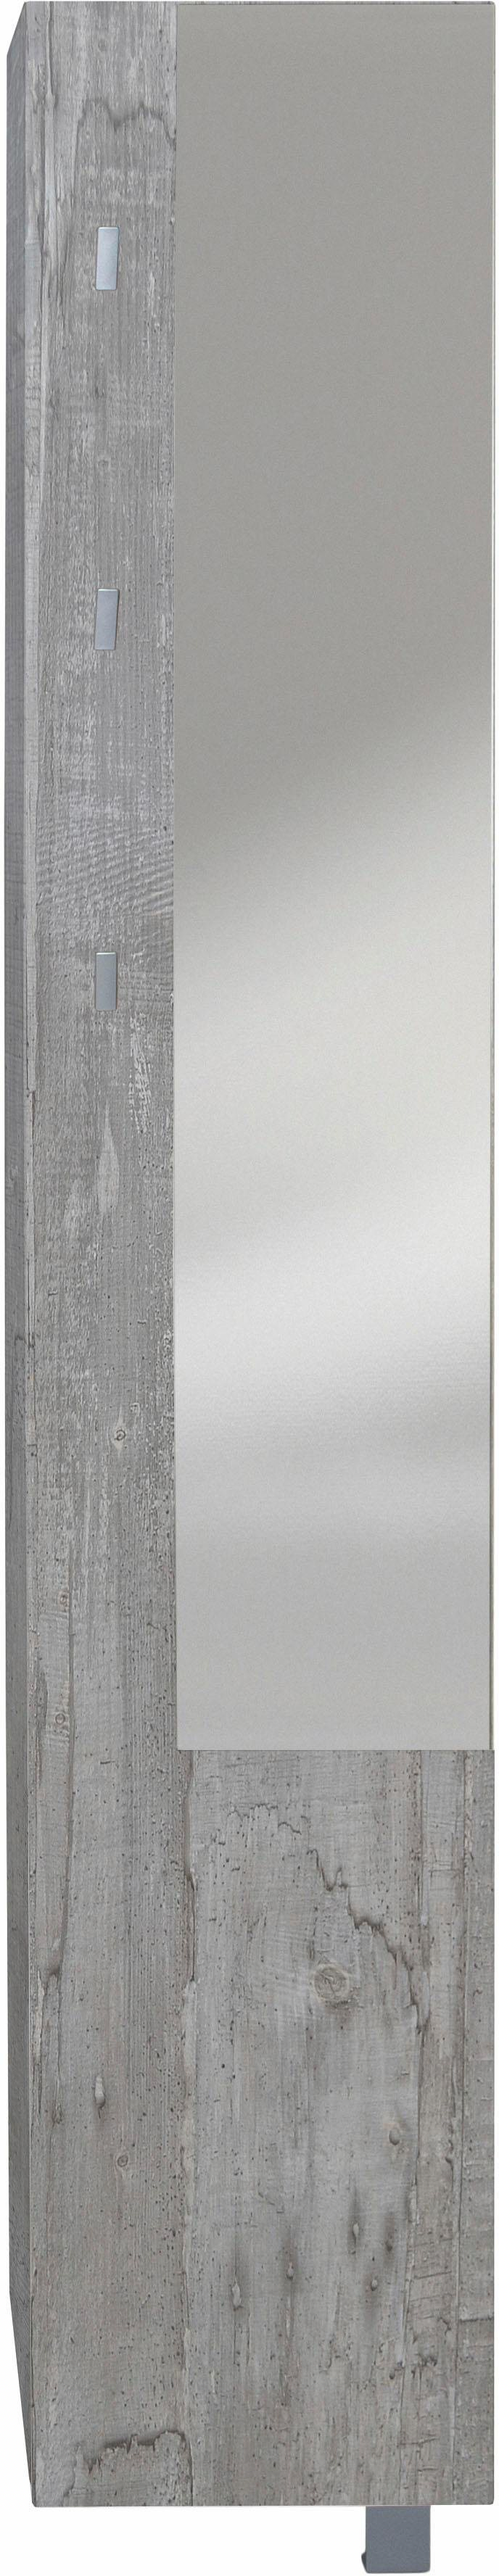 28 sparen drehbarer schuhschrank woody 3 nur 179 99 for Drehbarer schuhschrank